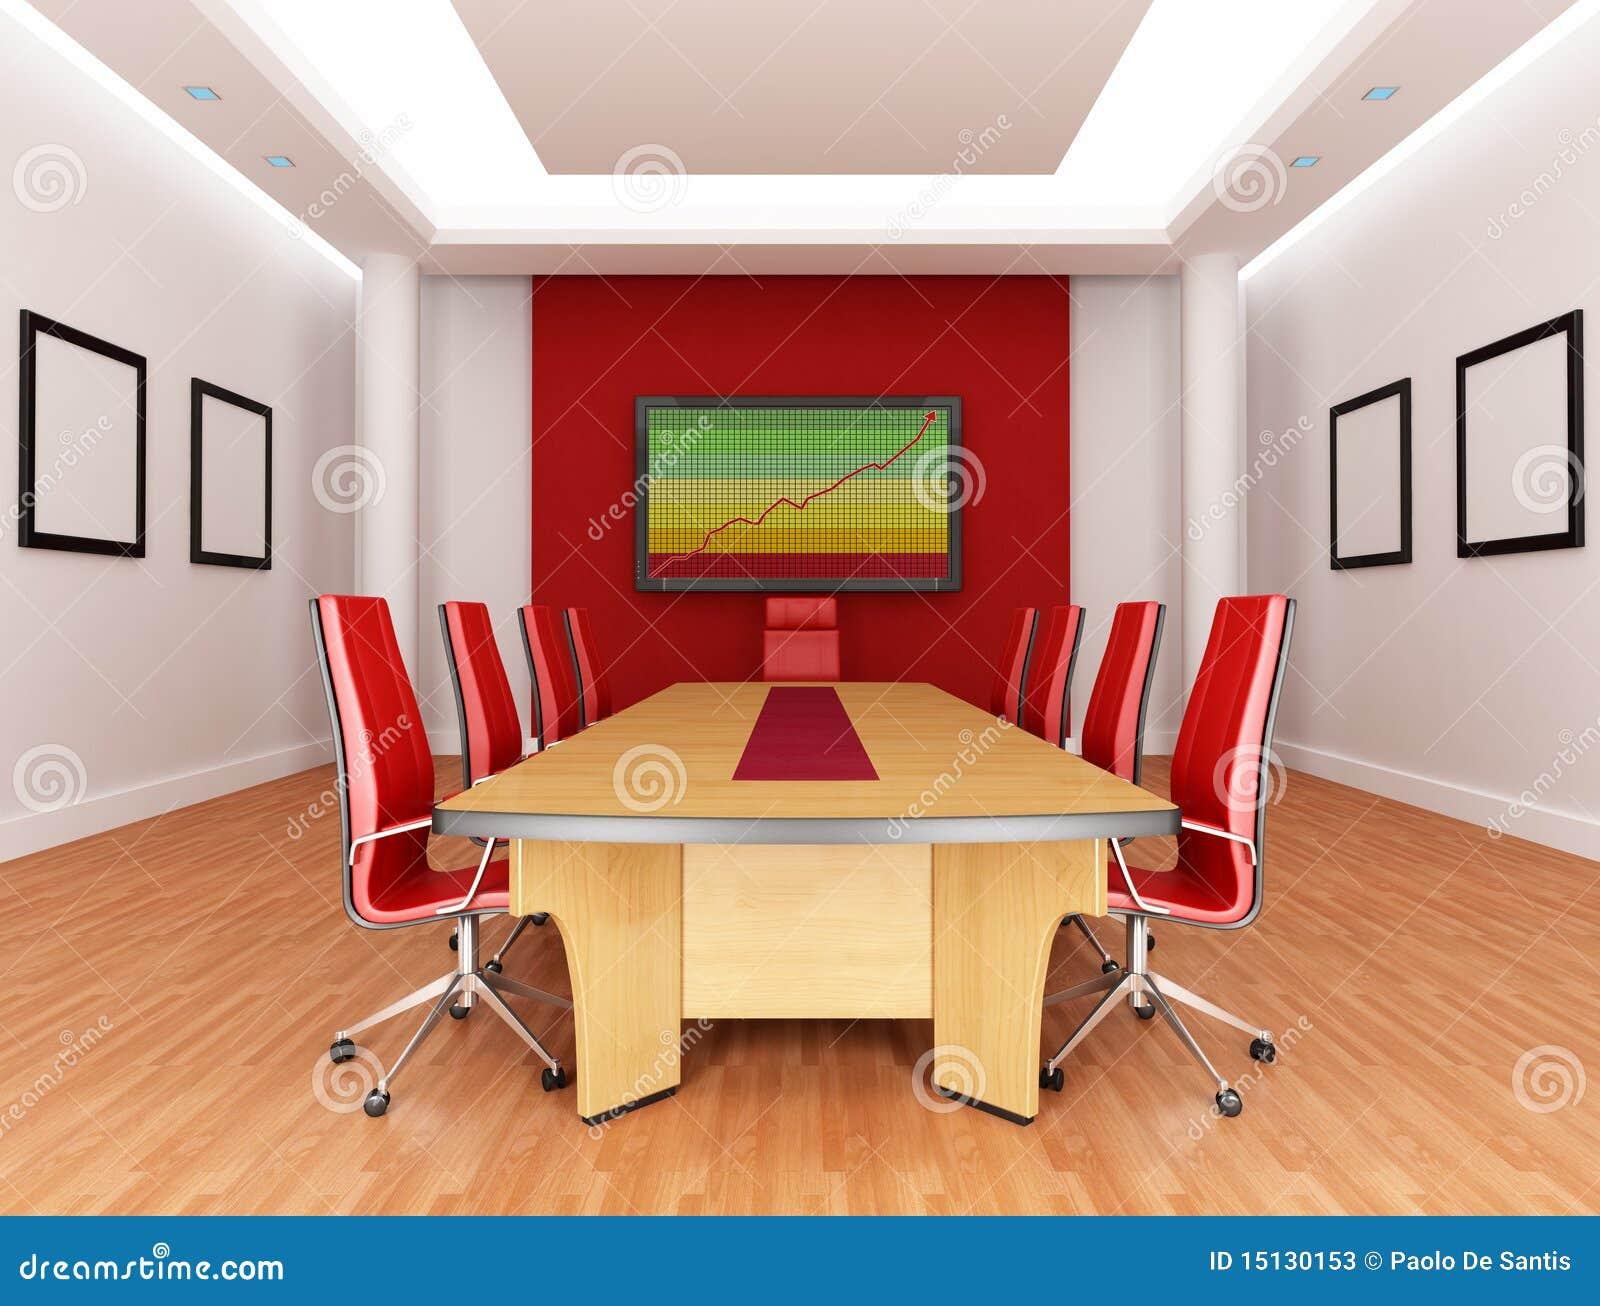 roter sitzungssaal stock abbildung illustration von. Black Bedroom Furniture Sets. Home Design Ideas